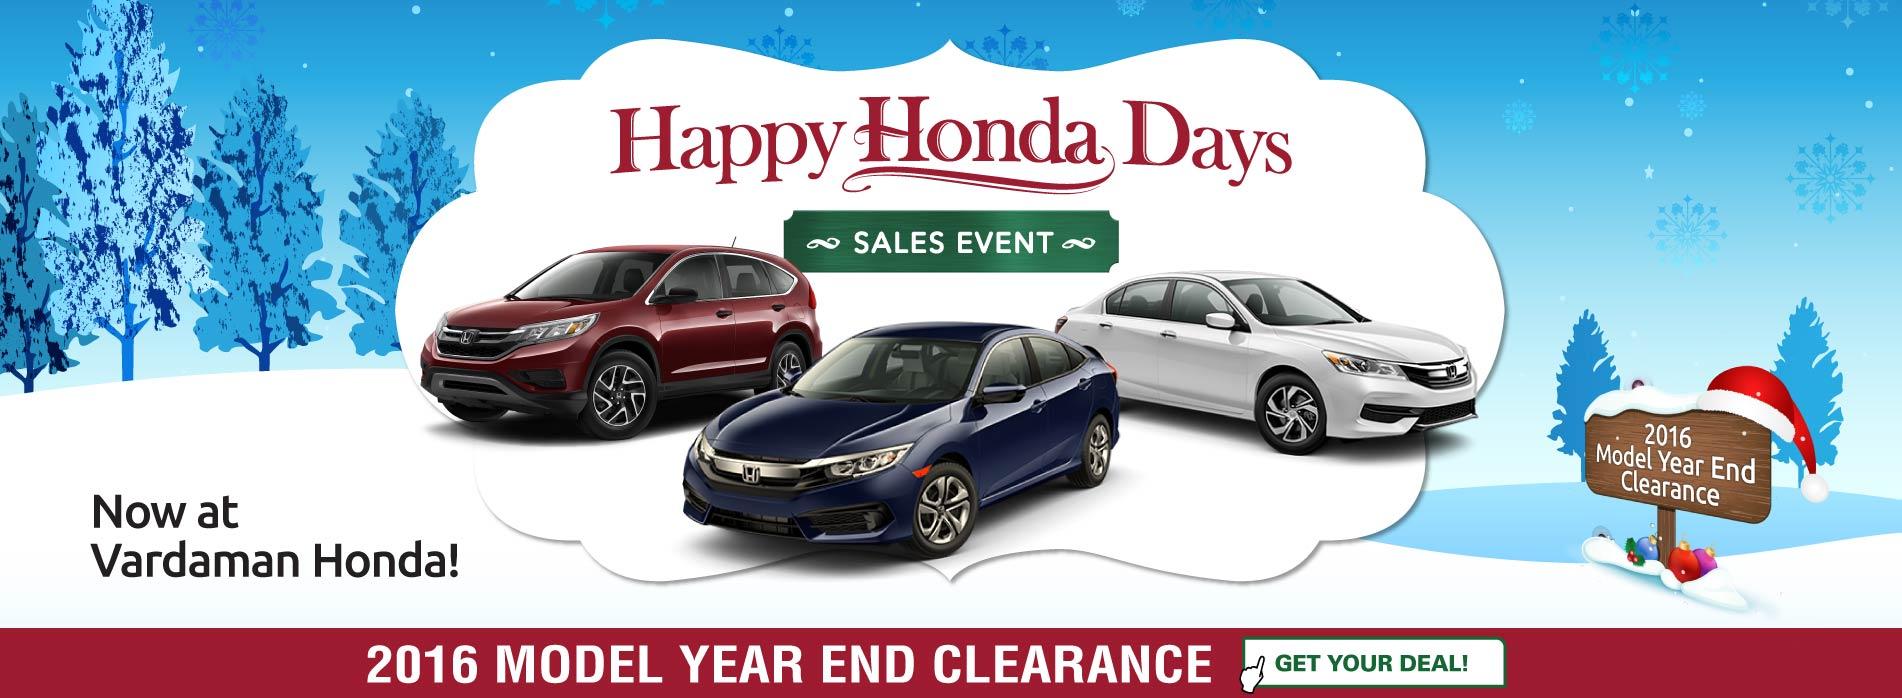 It's Happy Honda Days at Vardaman Honda